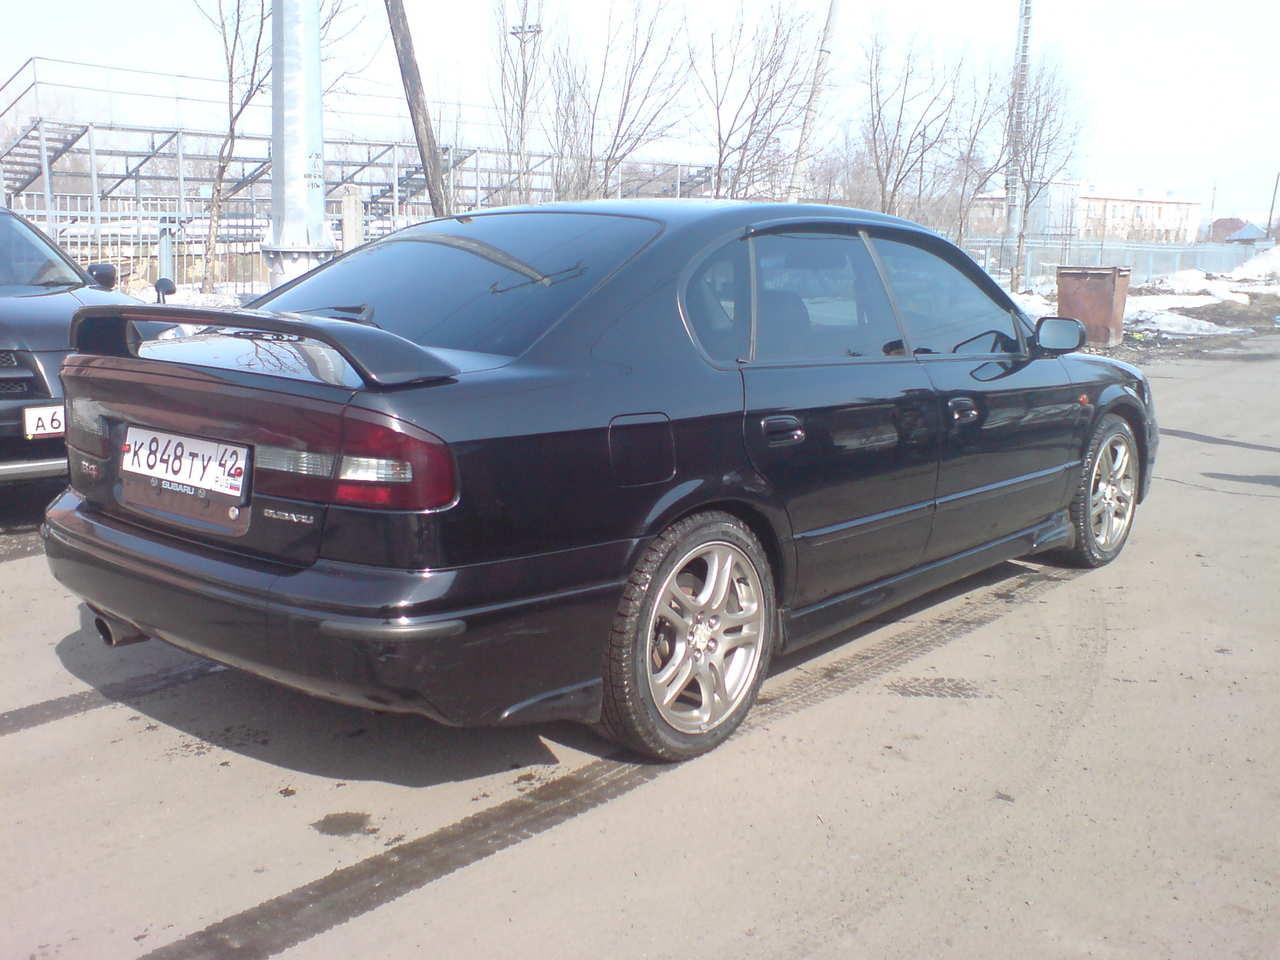 2000 Subaru Legacy B4 Photos, 2.0, Gasoline, Automatic For ...